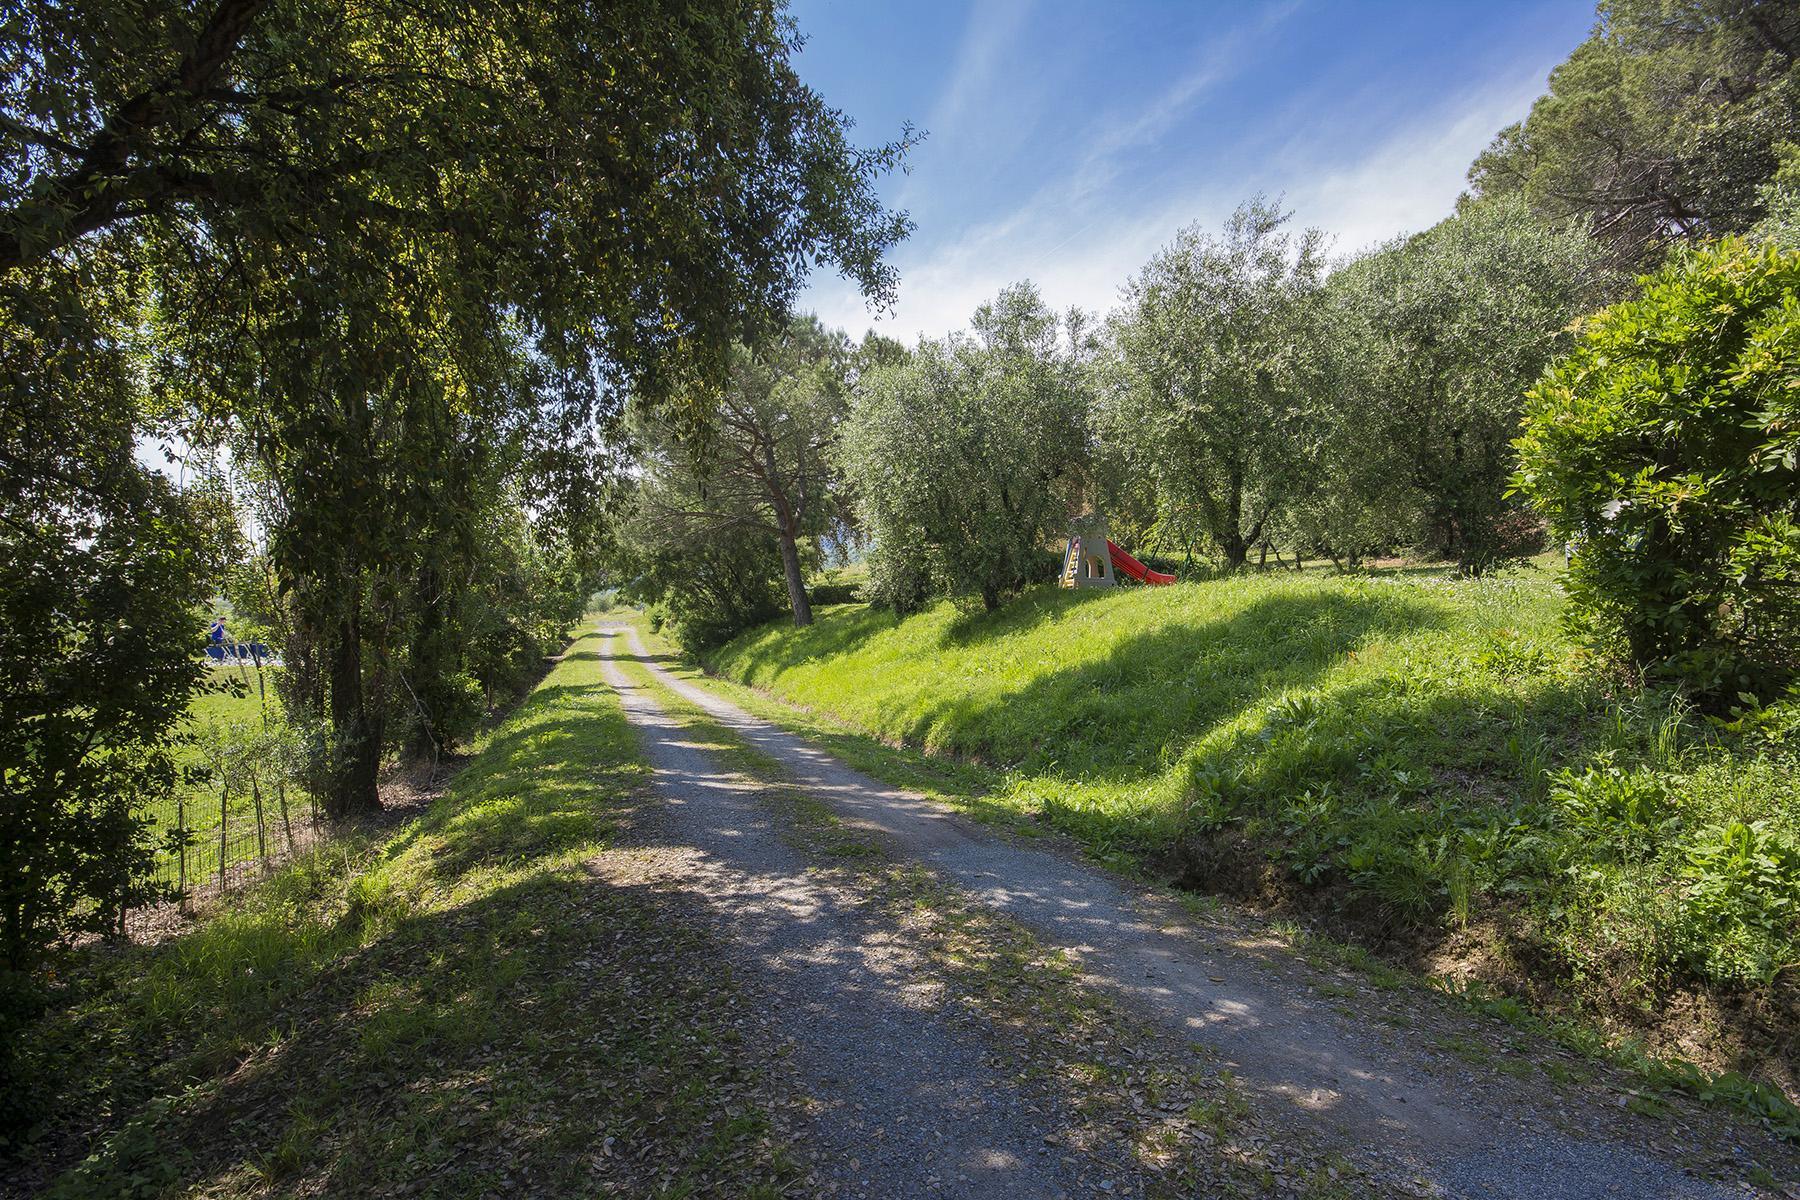 Pescia小山丘上美丽的乡间农舍 - 44